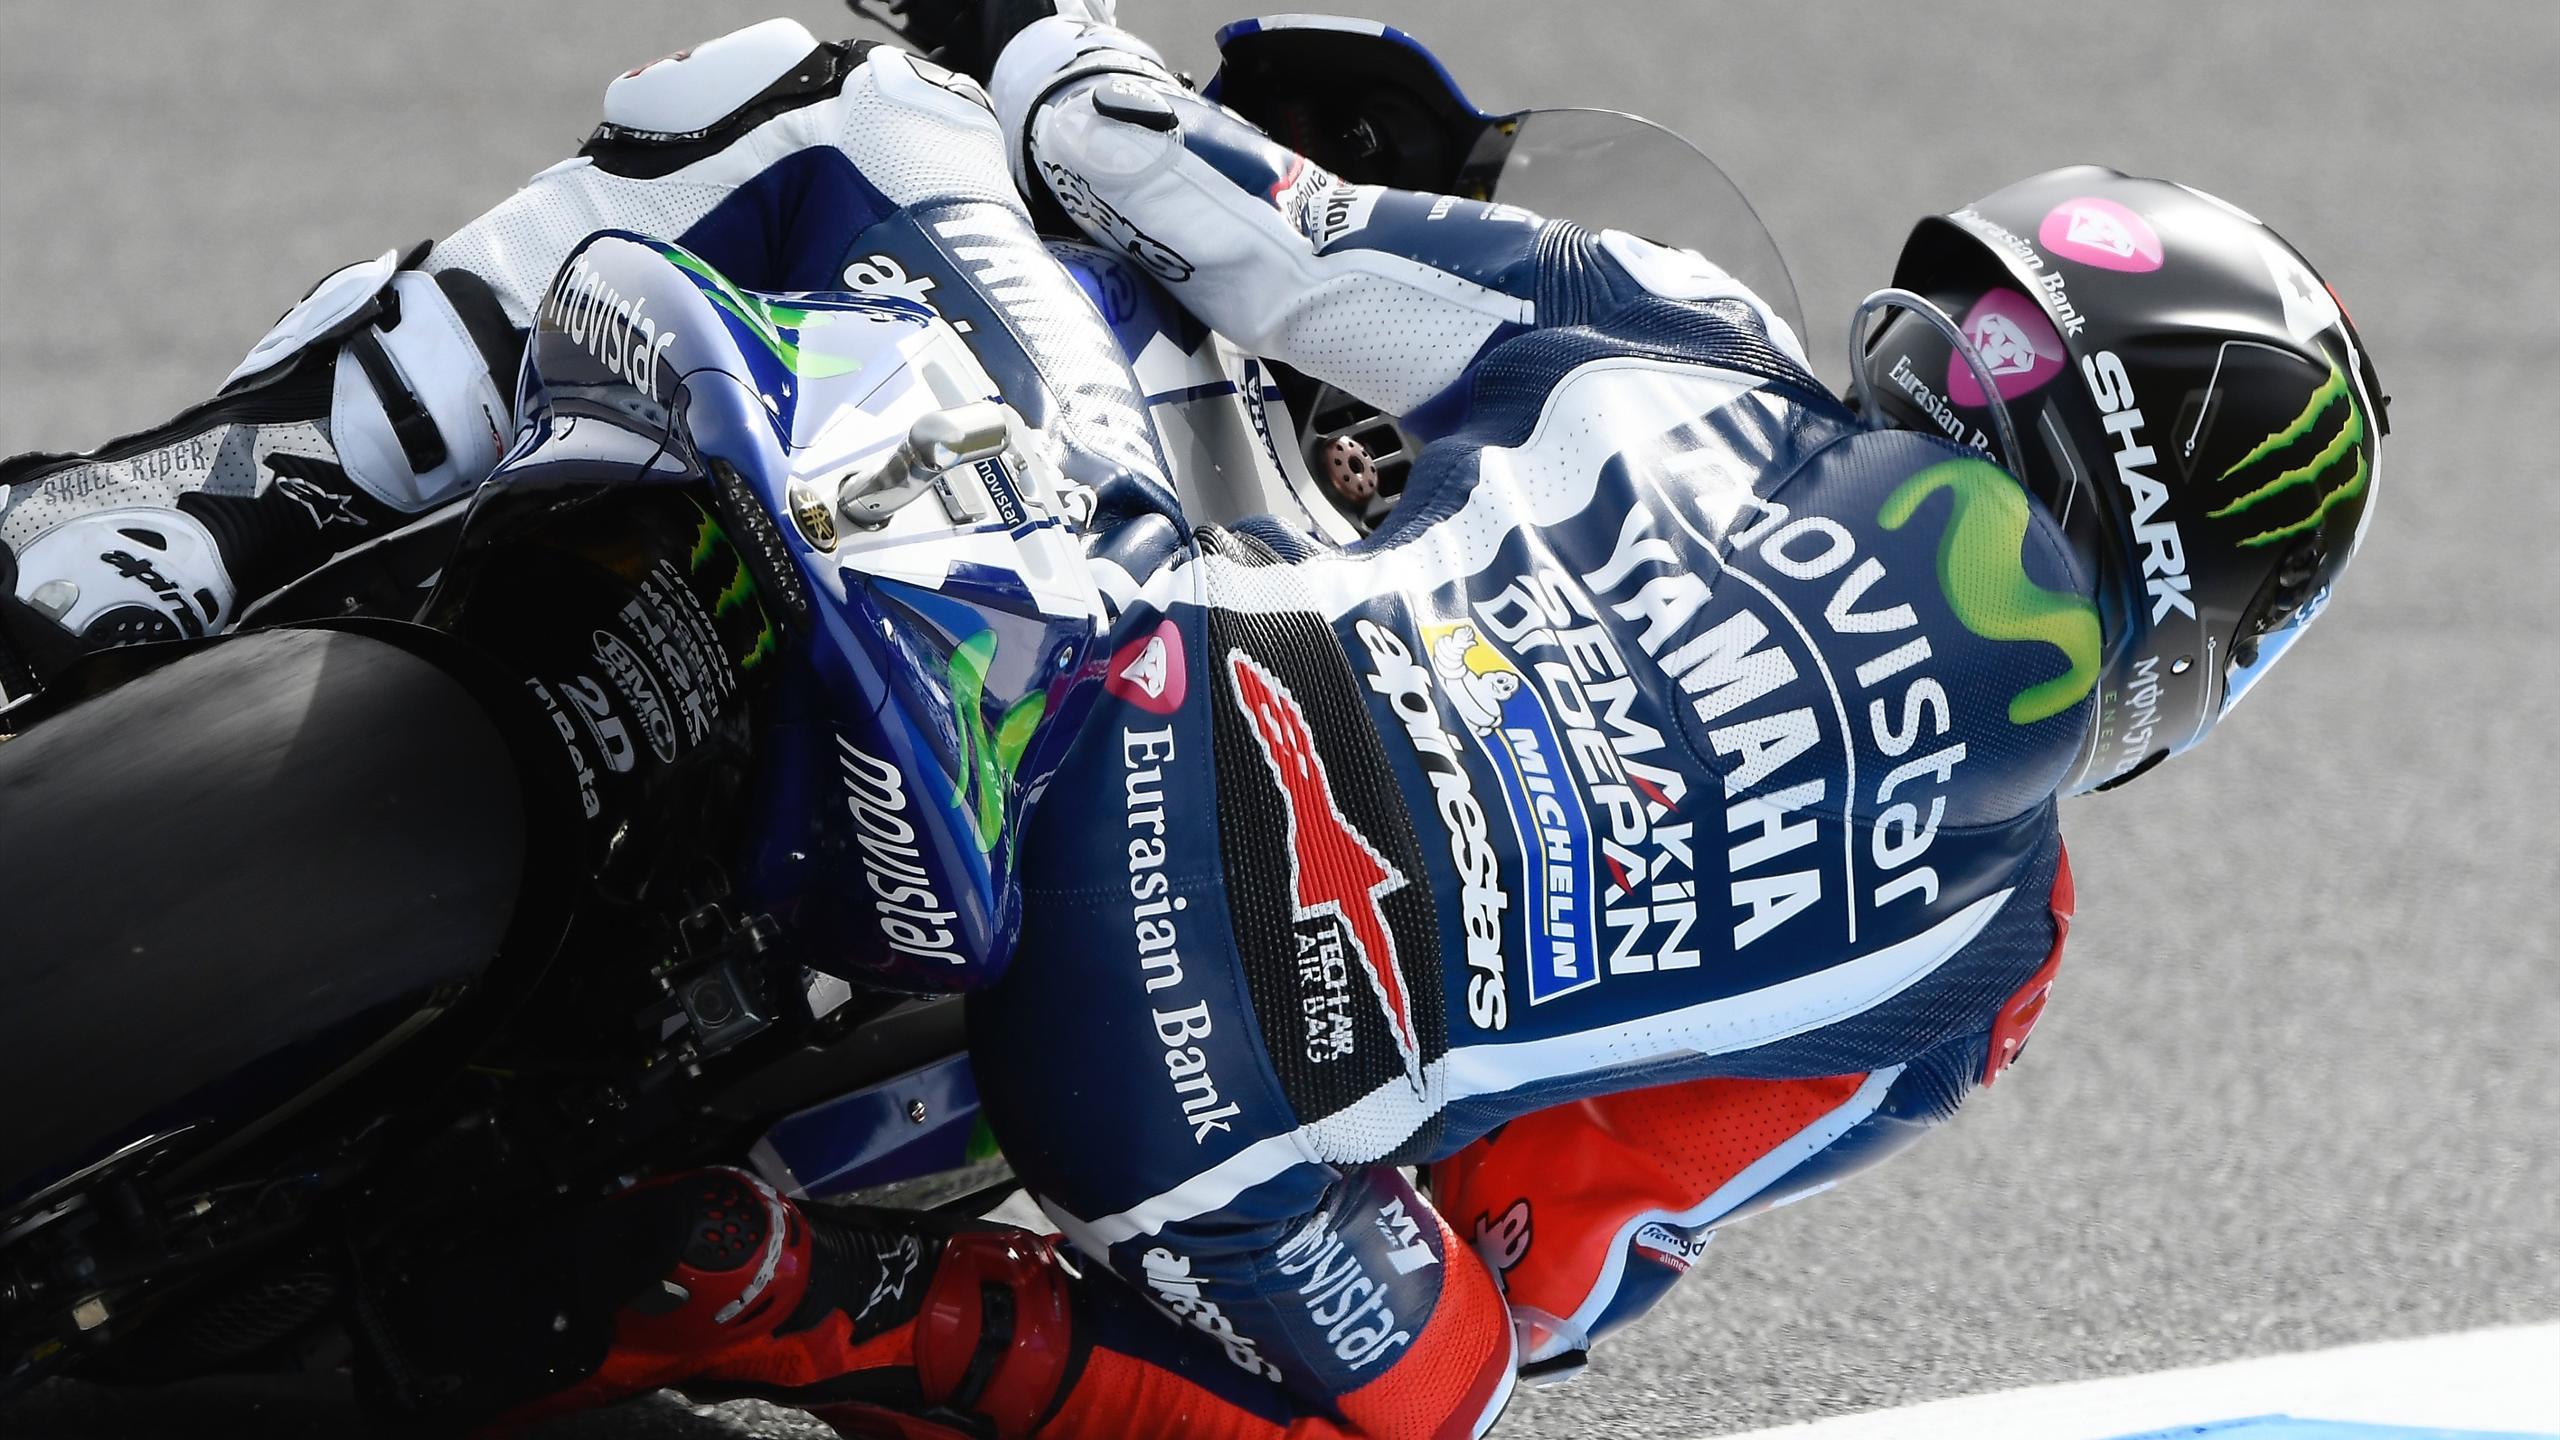 Jorge Lorenzo (Yamaha Factory) - GP of Japan 2016